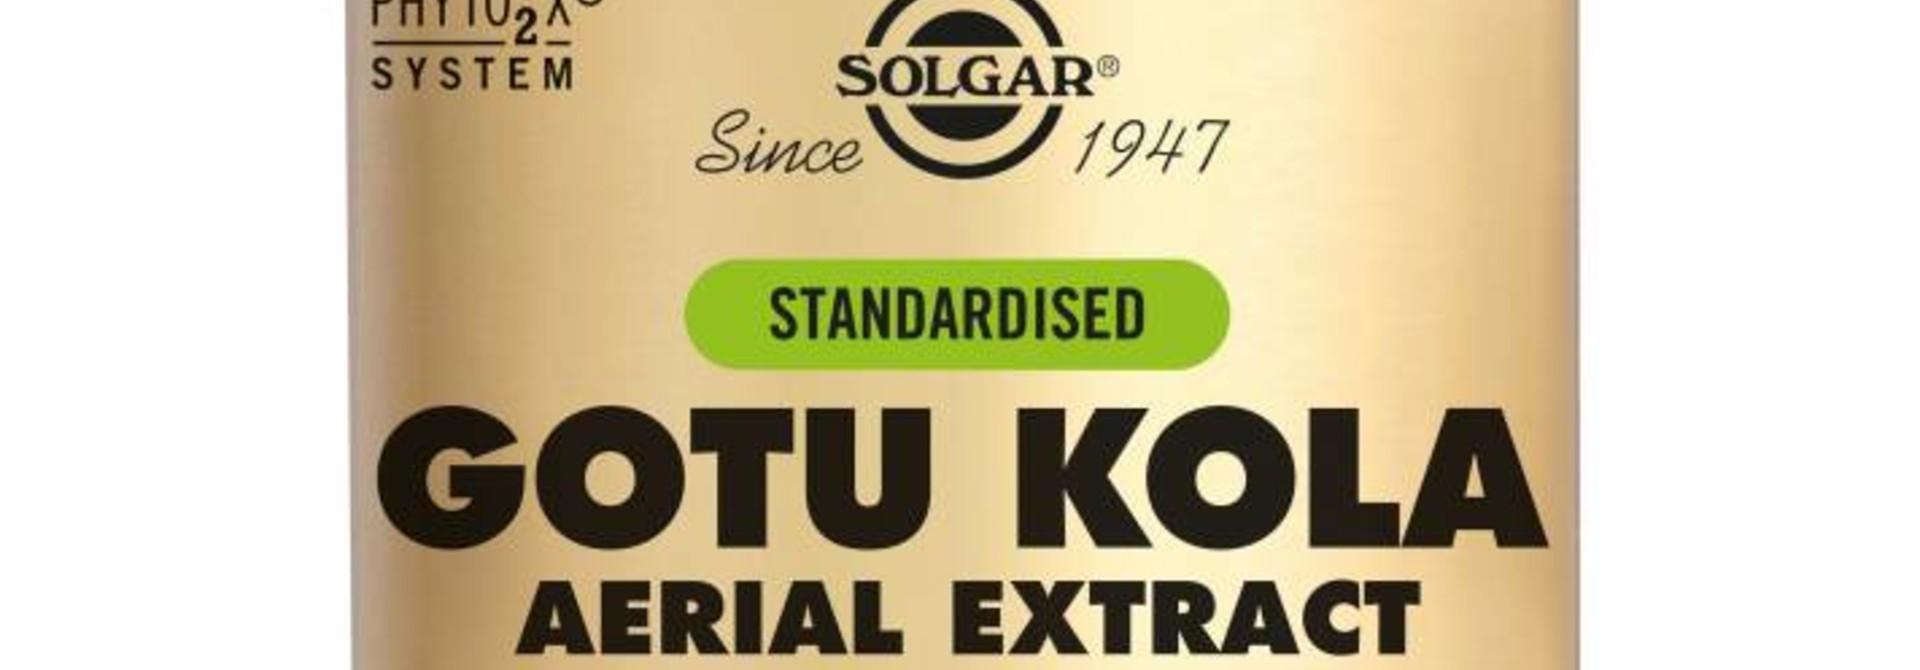 Gotu Kola Aerial Extract 100 plantaardige capsules